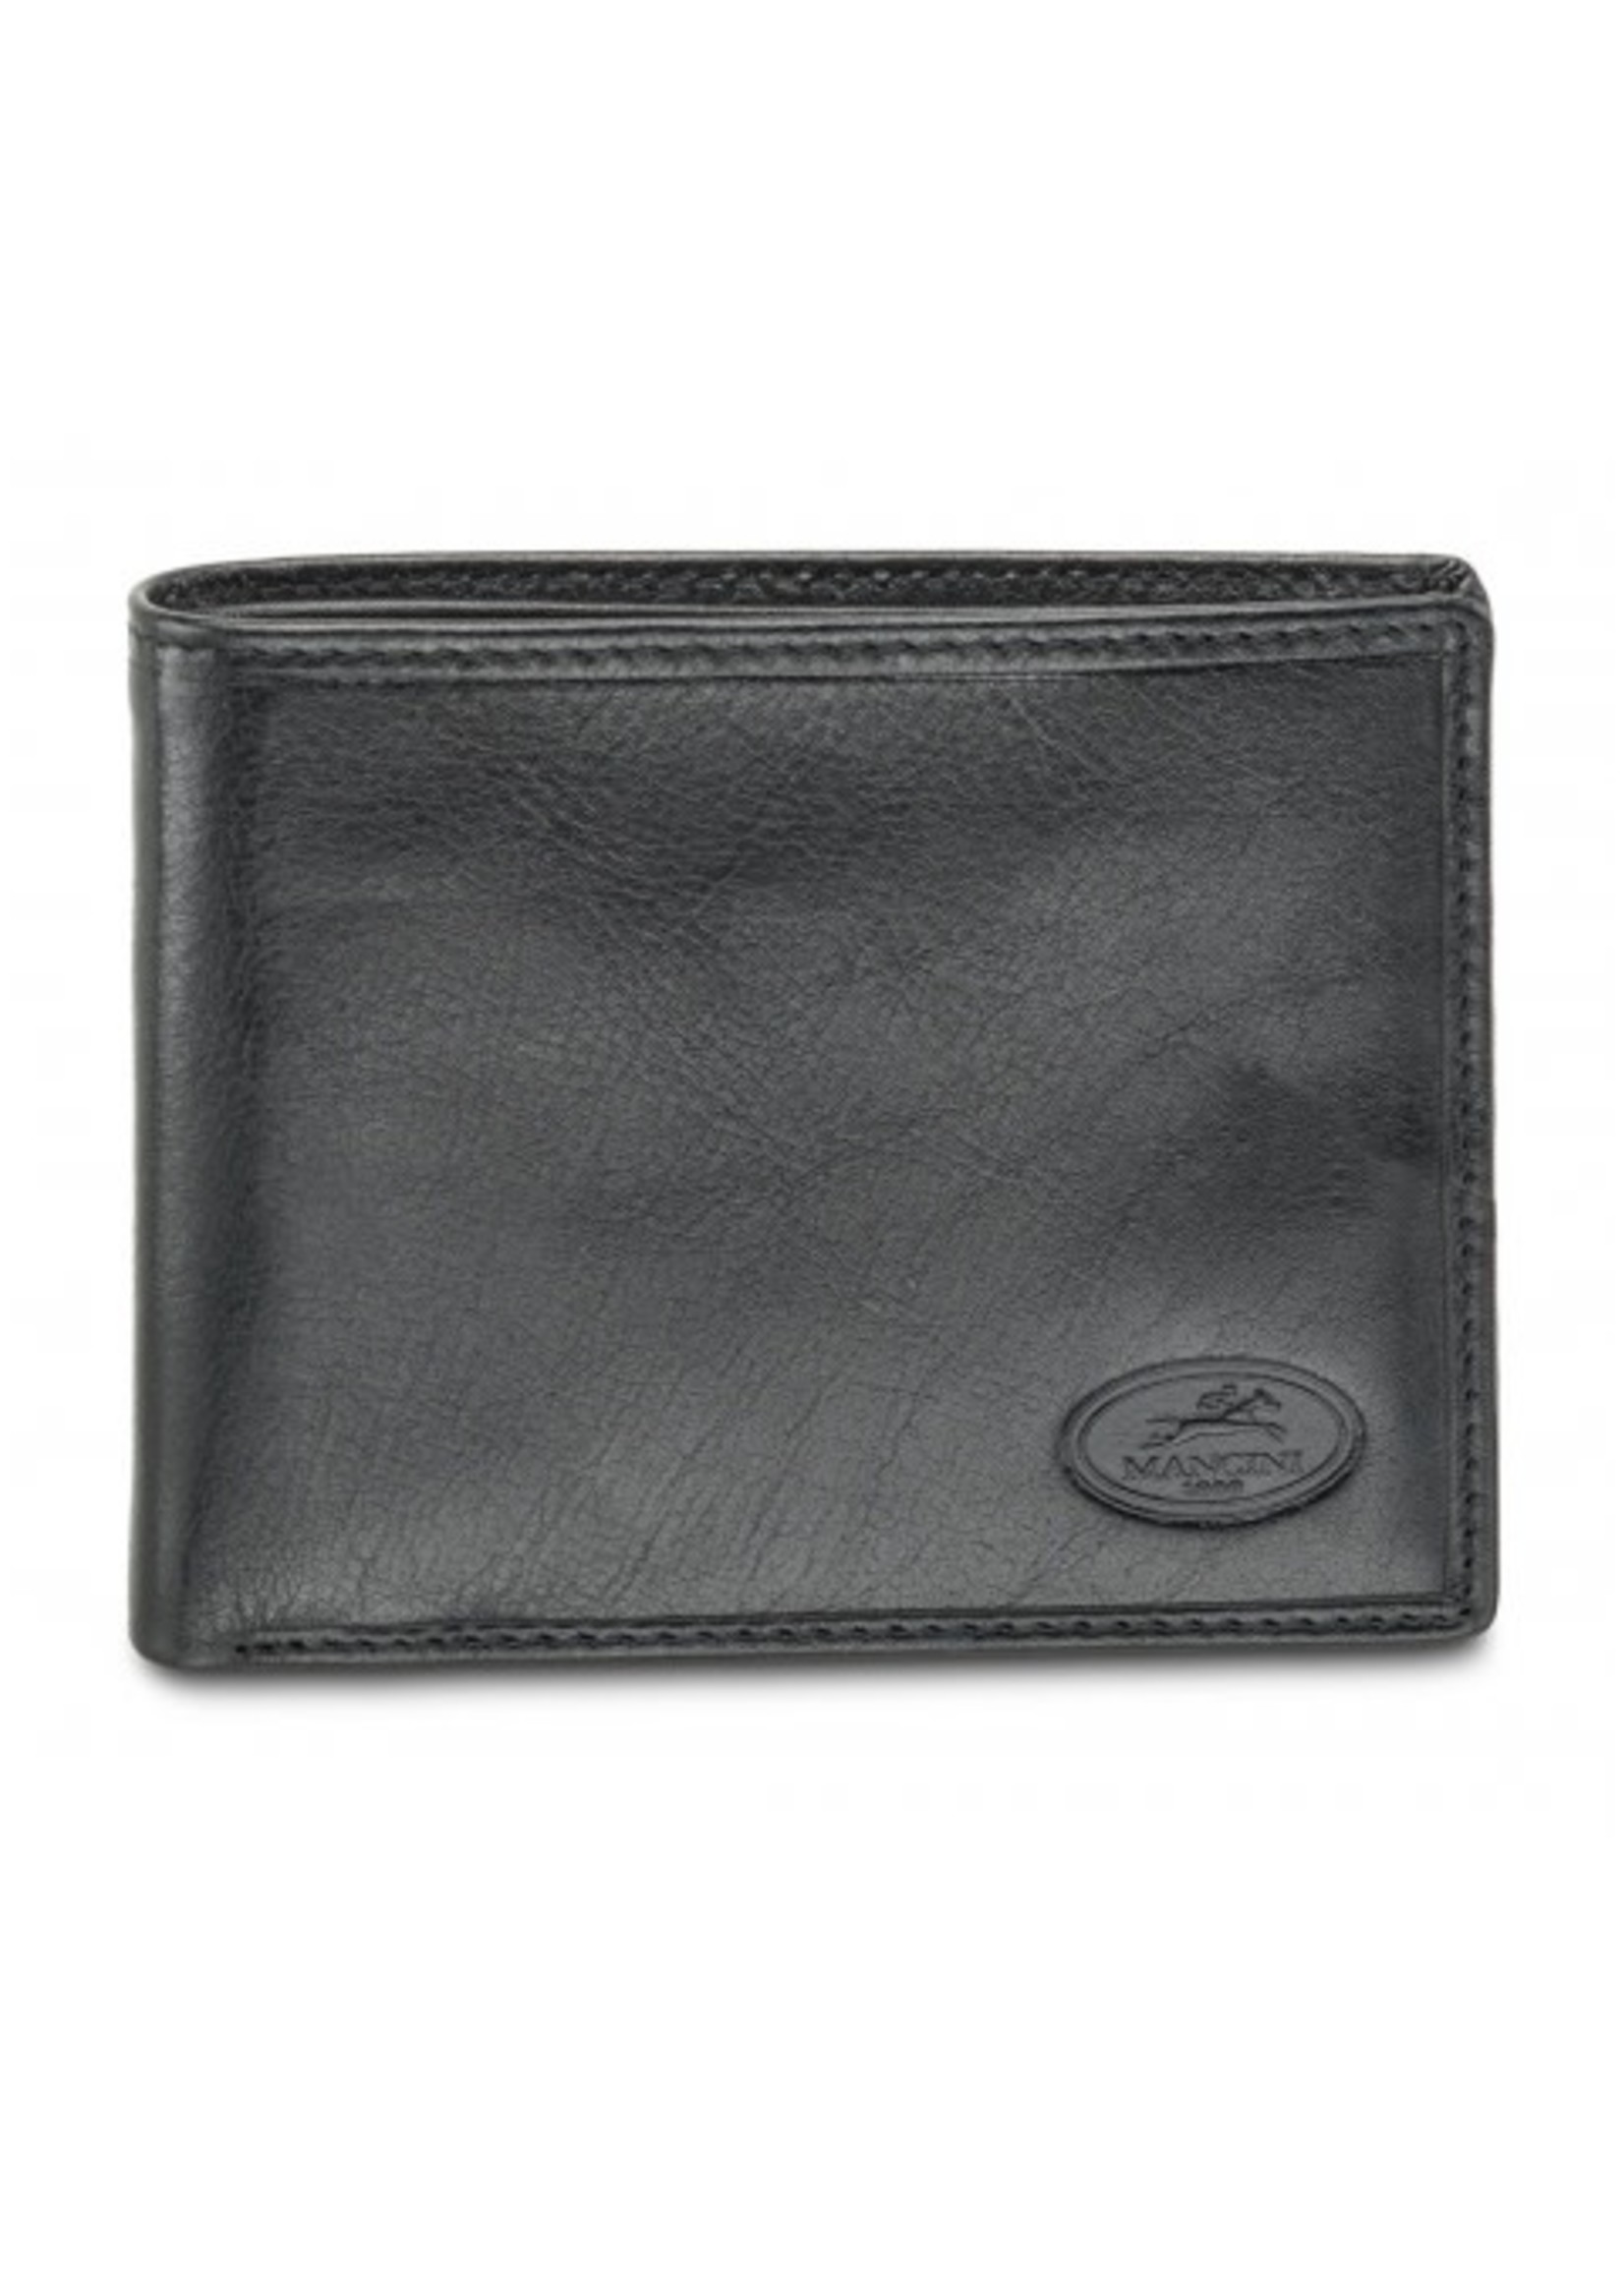 Mancini Men's RFID Secure Classic Billfold Wallet - Black